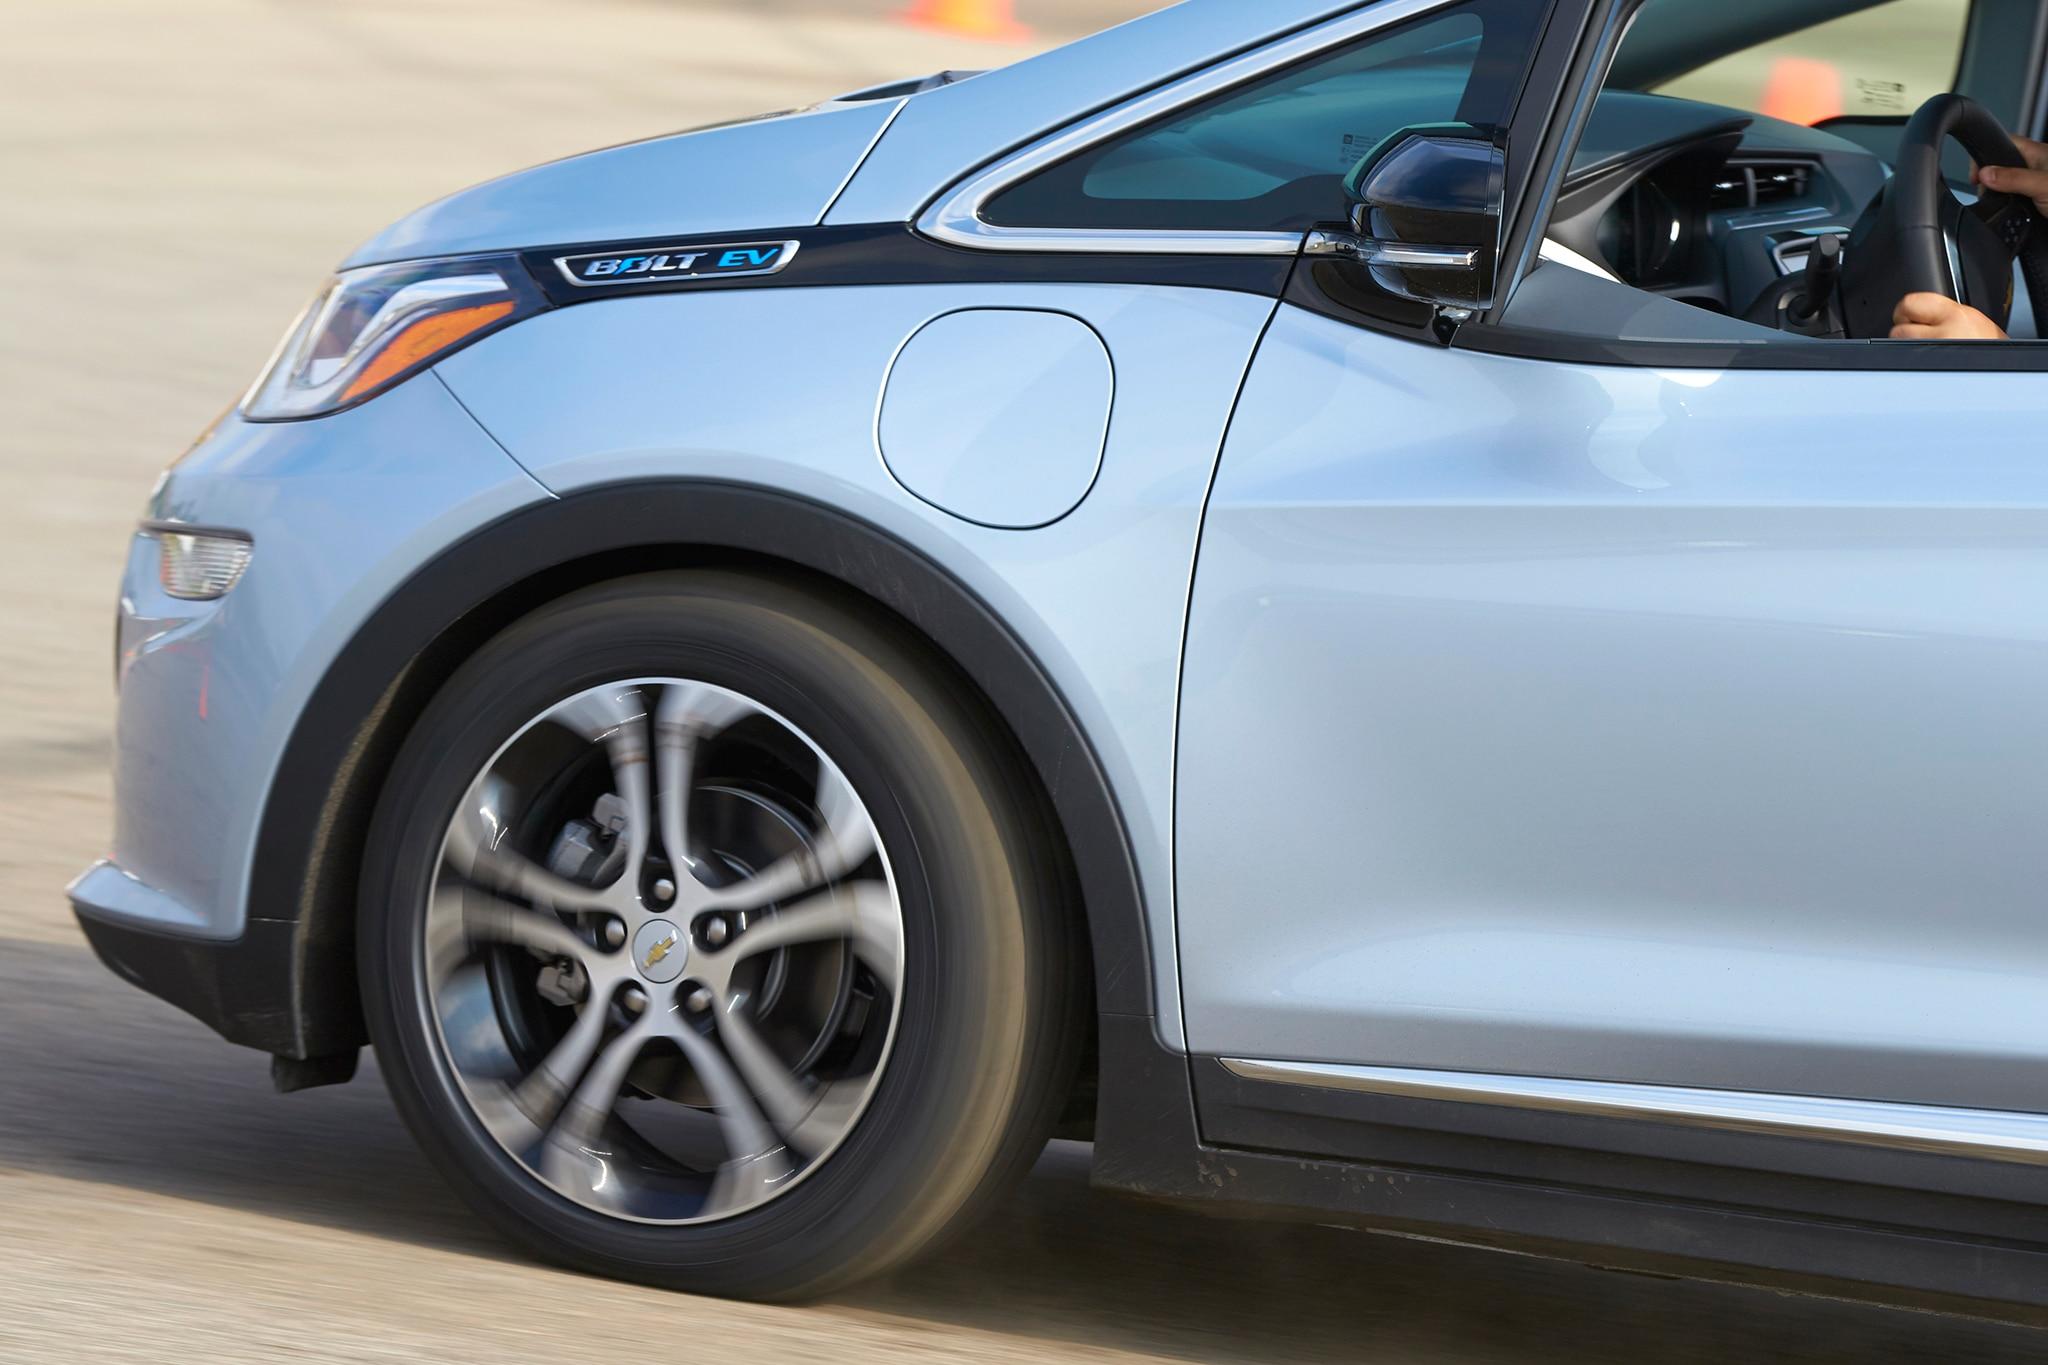 2017 Chevrolet Bolt EV Detail 02